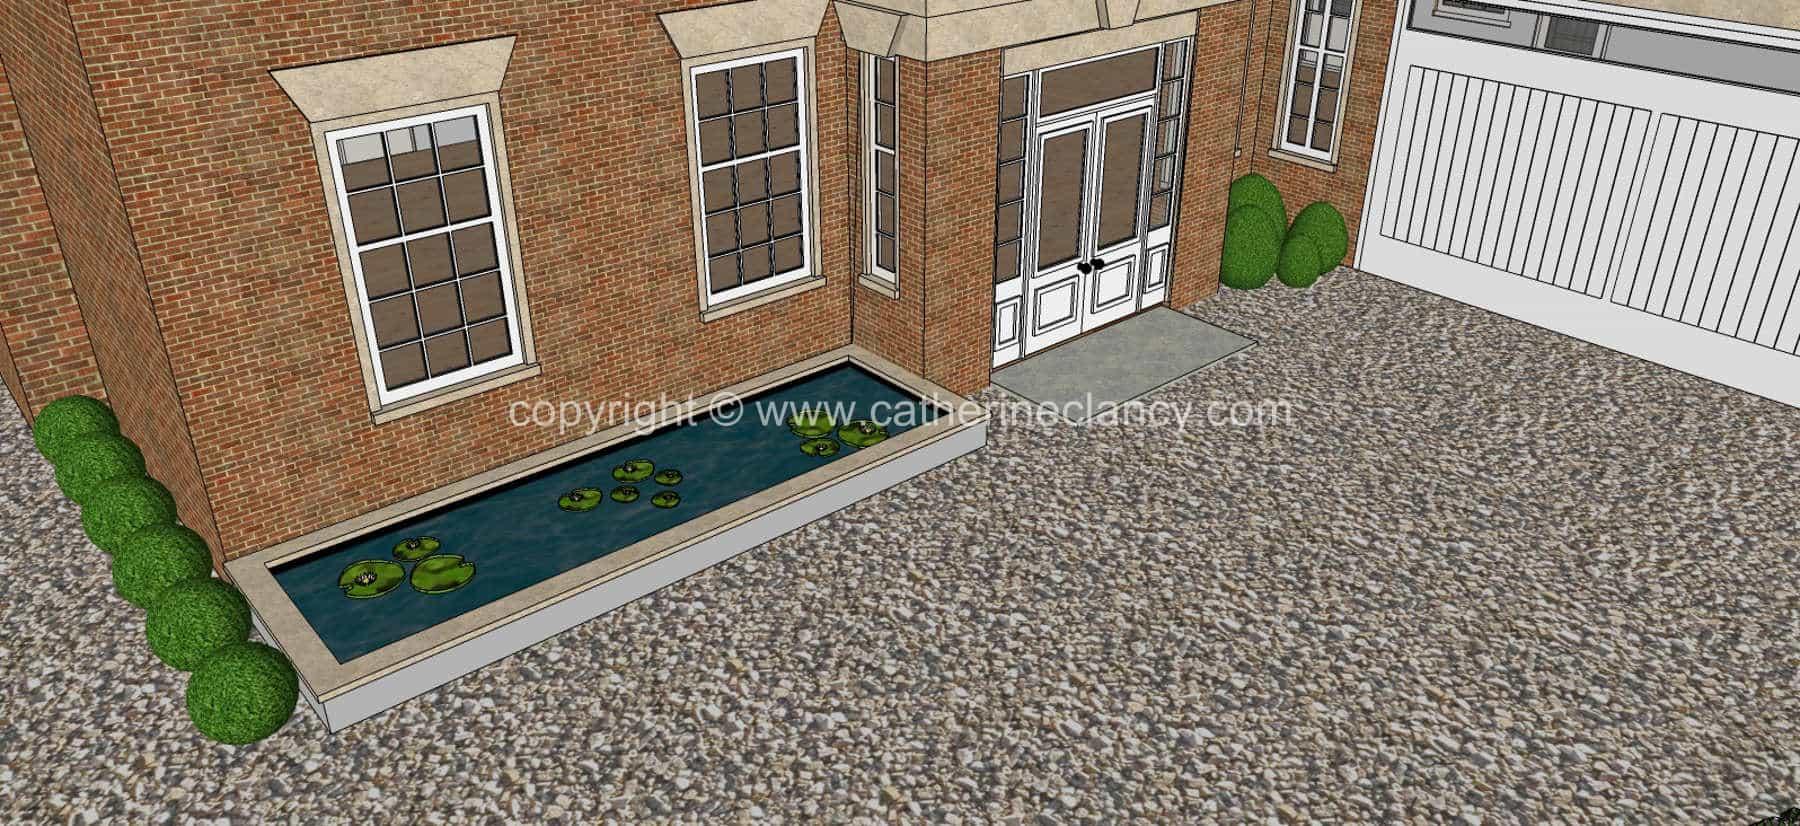 hendon-grand-design-garden-12